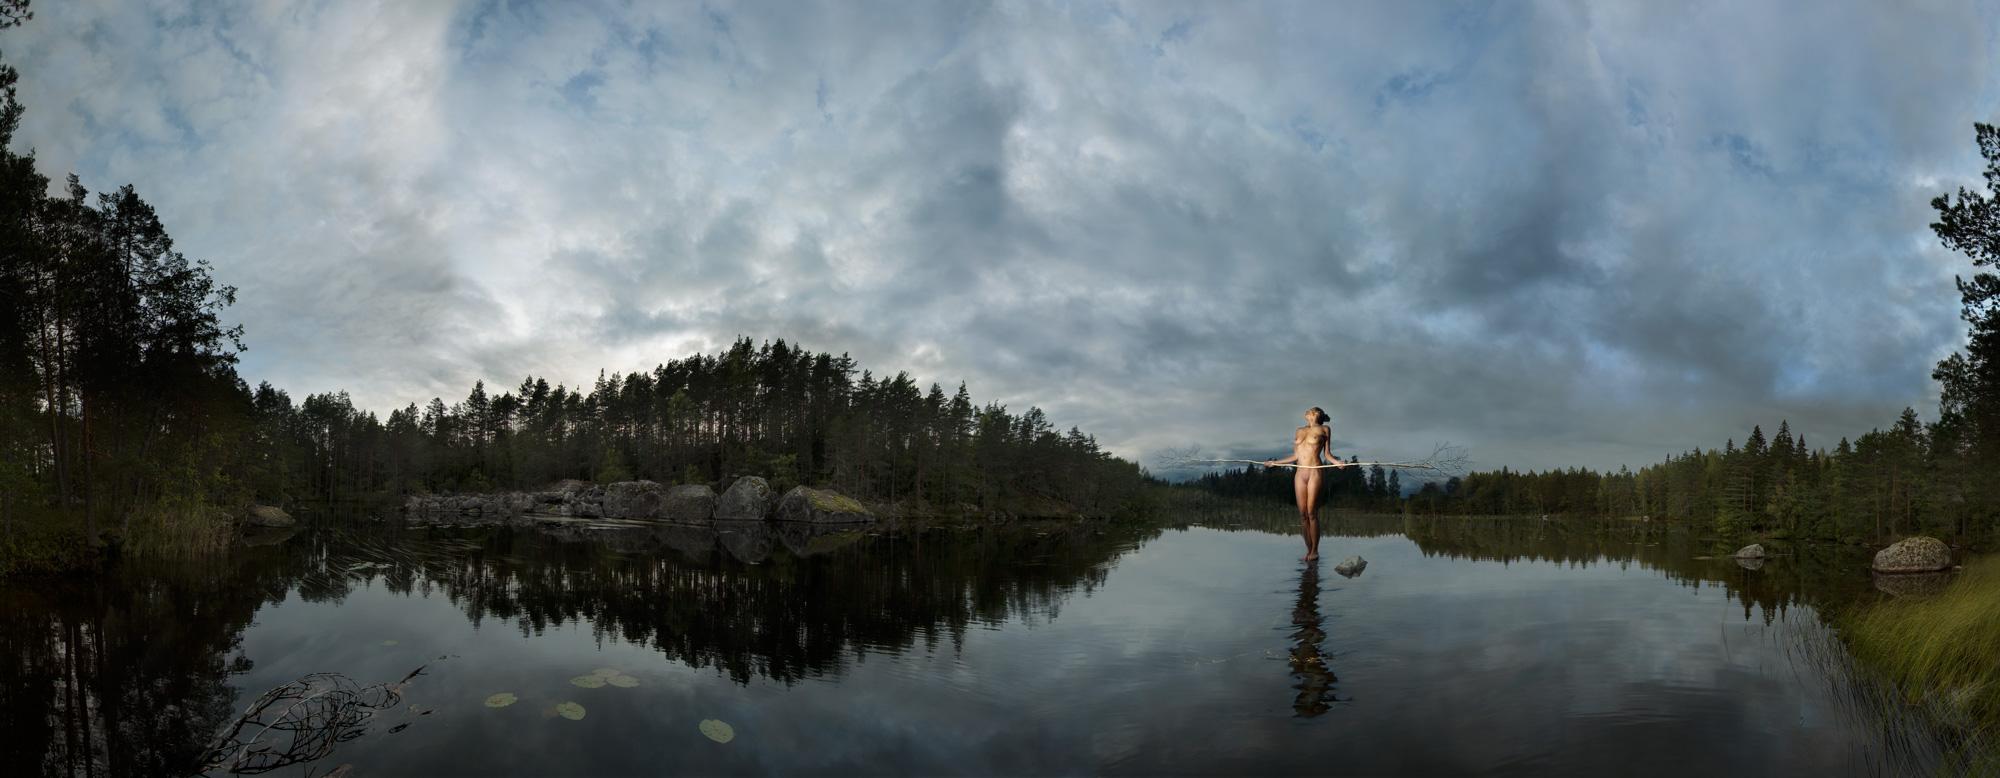 KÄÄNNA JUURI IV. Fotografía y retoque digital. Lago Ritajarven, Hämeenkyrö, Finlandia